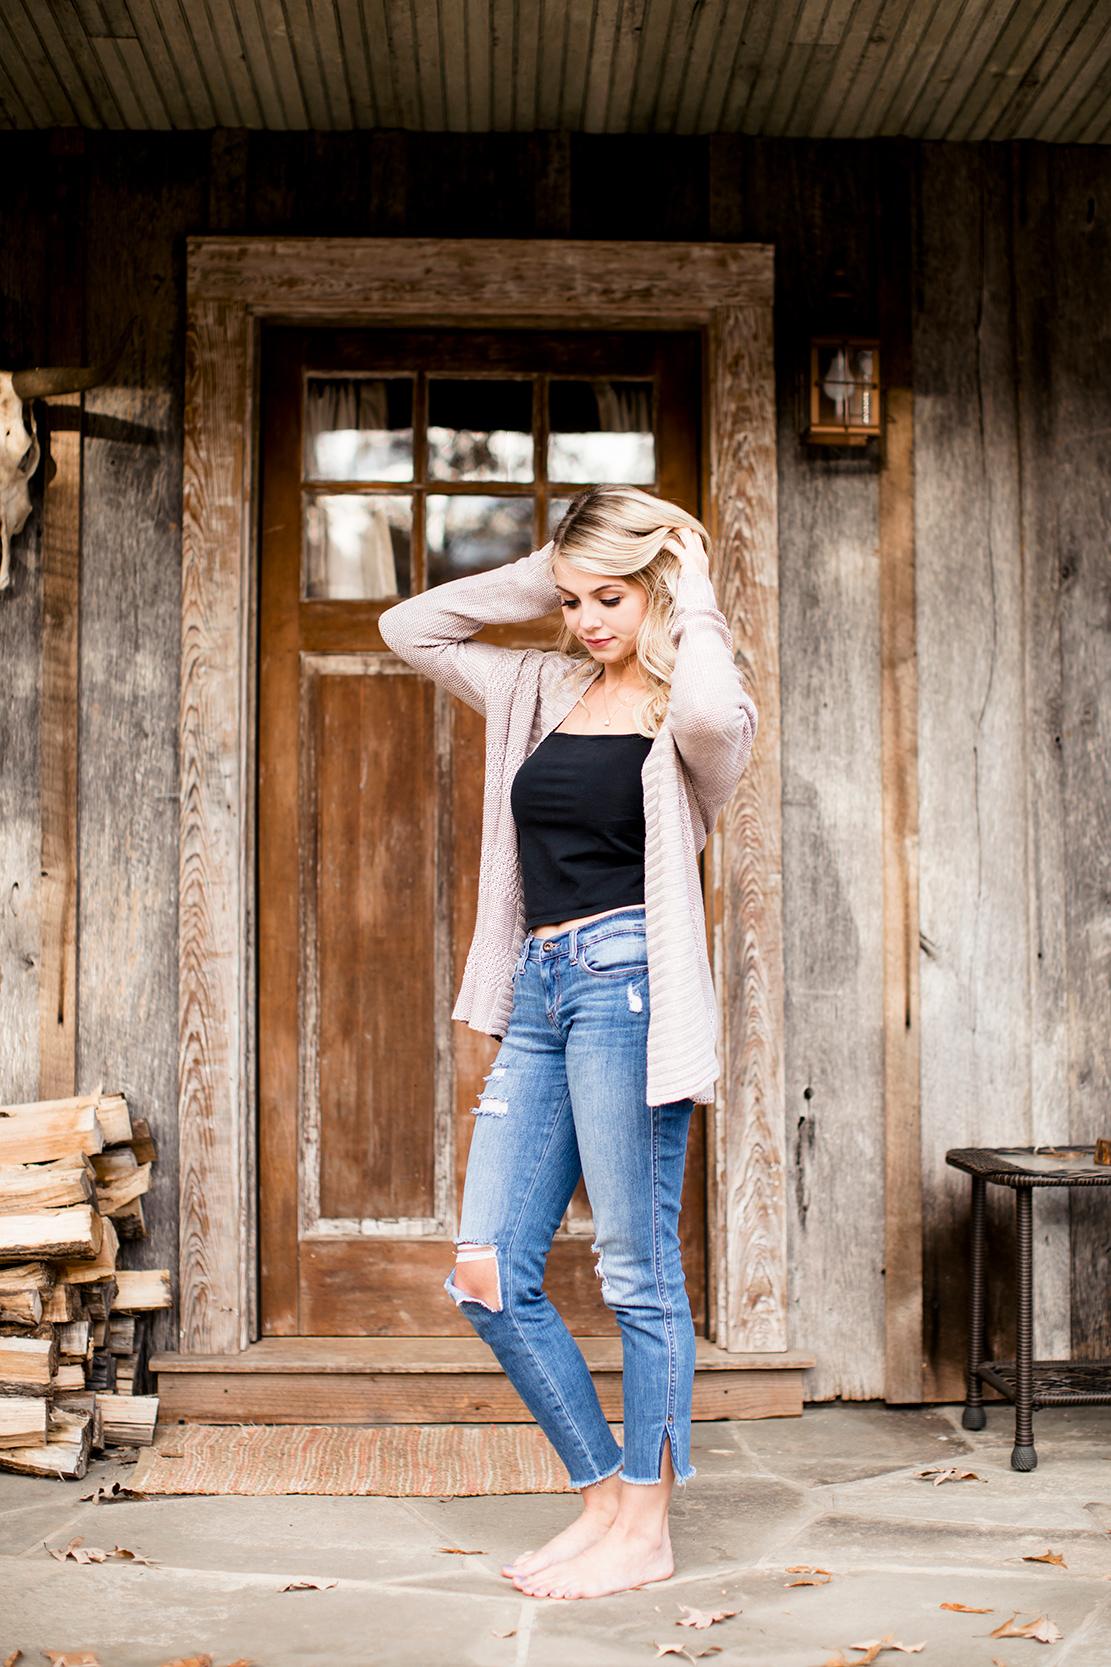 Rustic Cabin Female Boudoir Portraits  JD Photo LLC